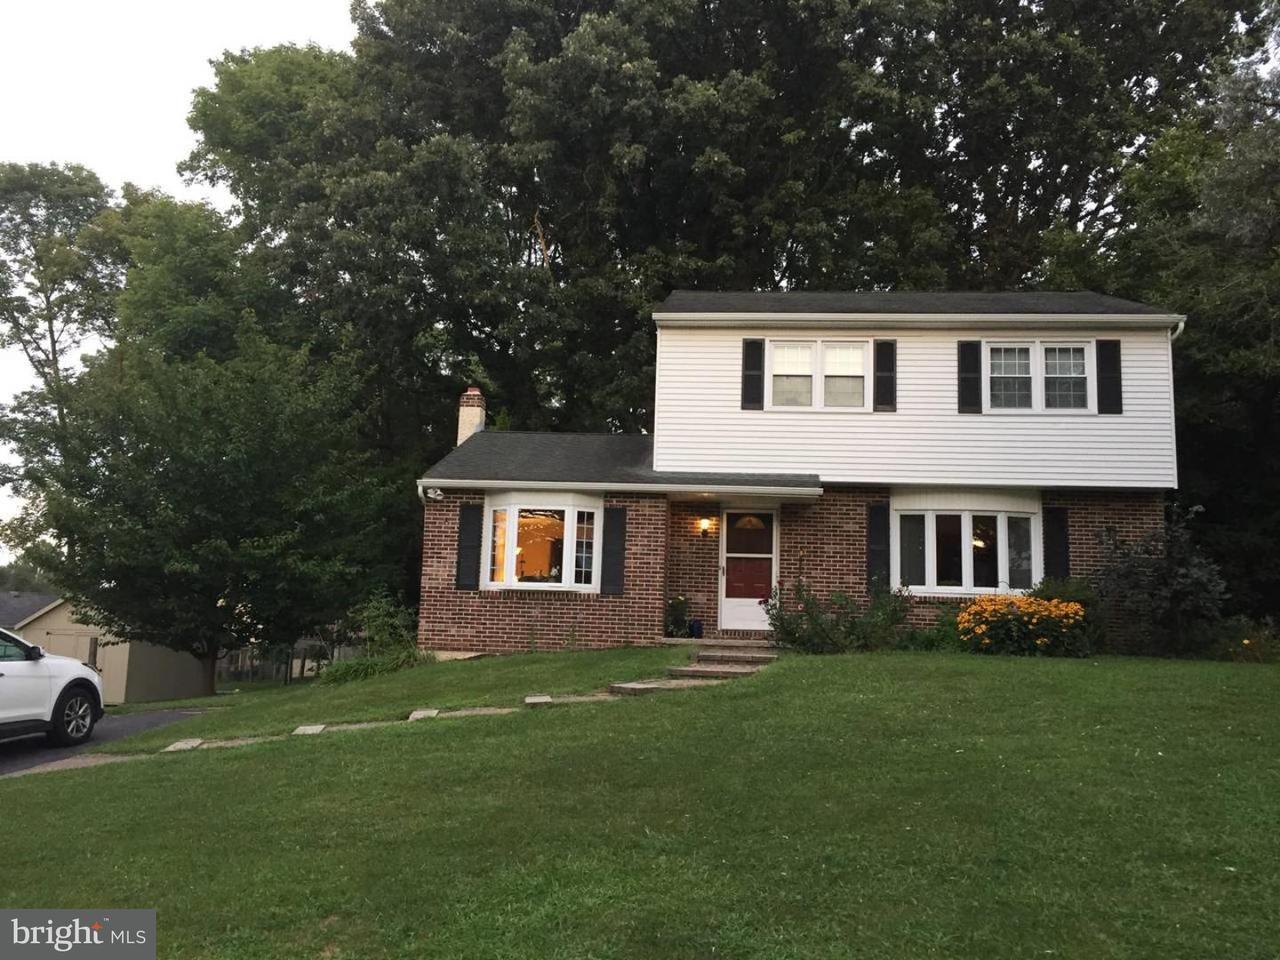 Casa Unifamiliar por un Alquiler en 209 VALLEY VIEW Lane Downingtown, Pennsylvania 19335 Estados Unidos